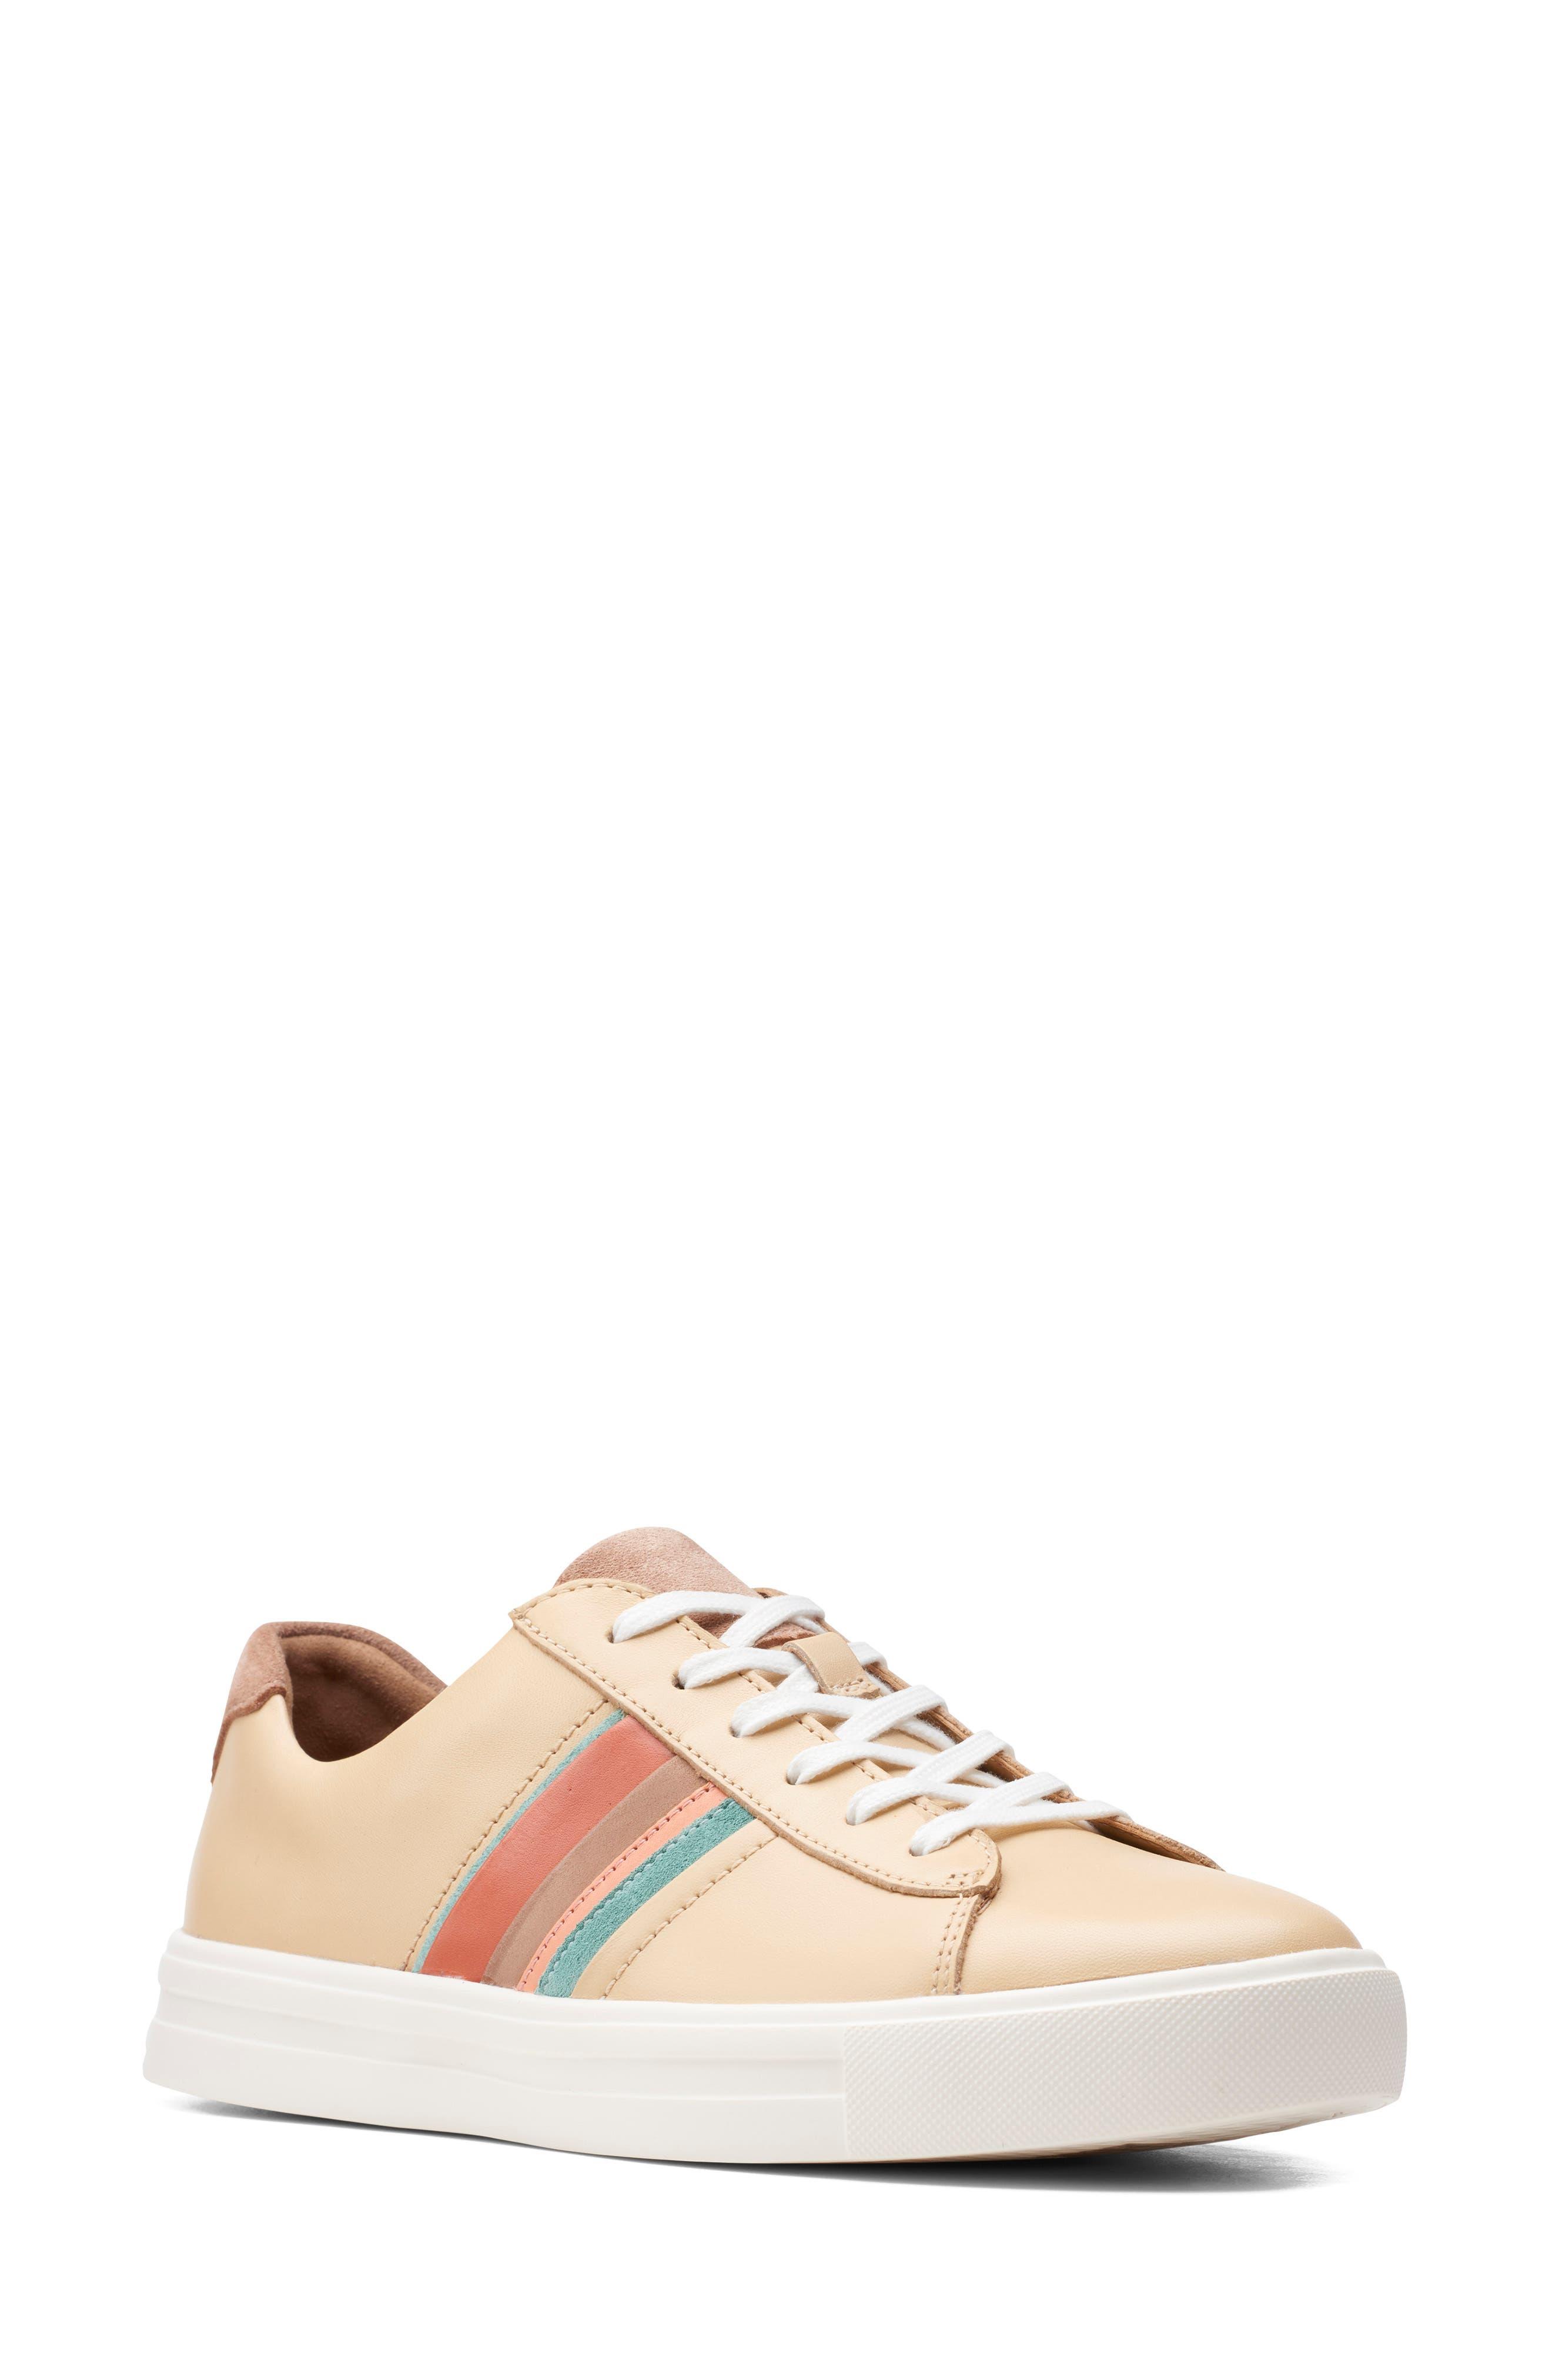 Vintage Shoes in Pictures | Shop Vintage Style Shoes Womens Clarks Un Maui Band Sneaker $90.96 AT vintagedancer.com